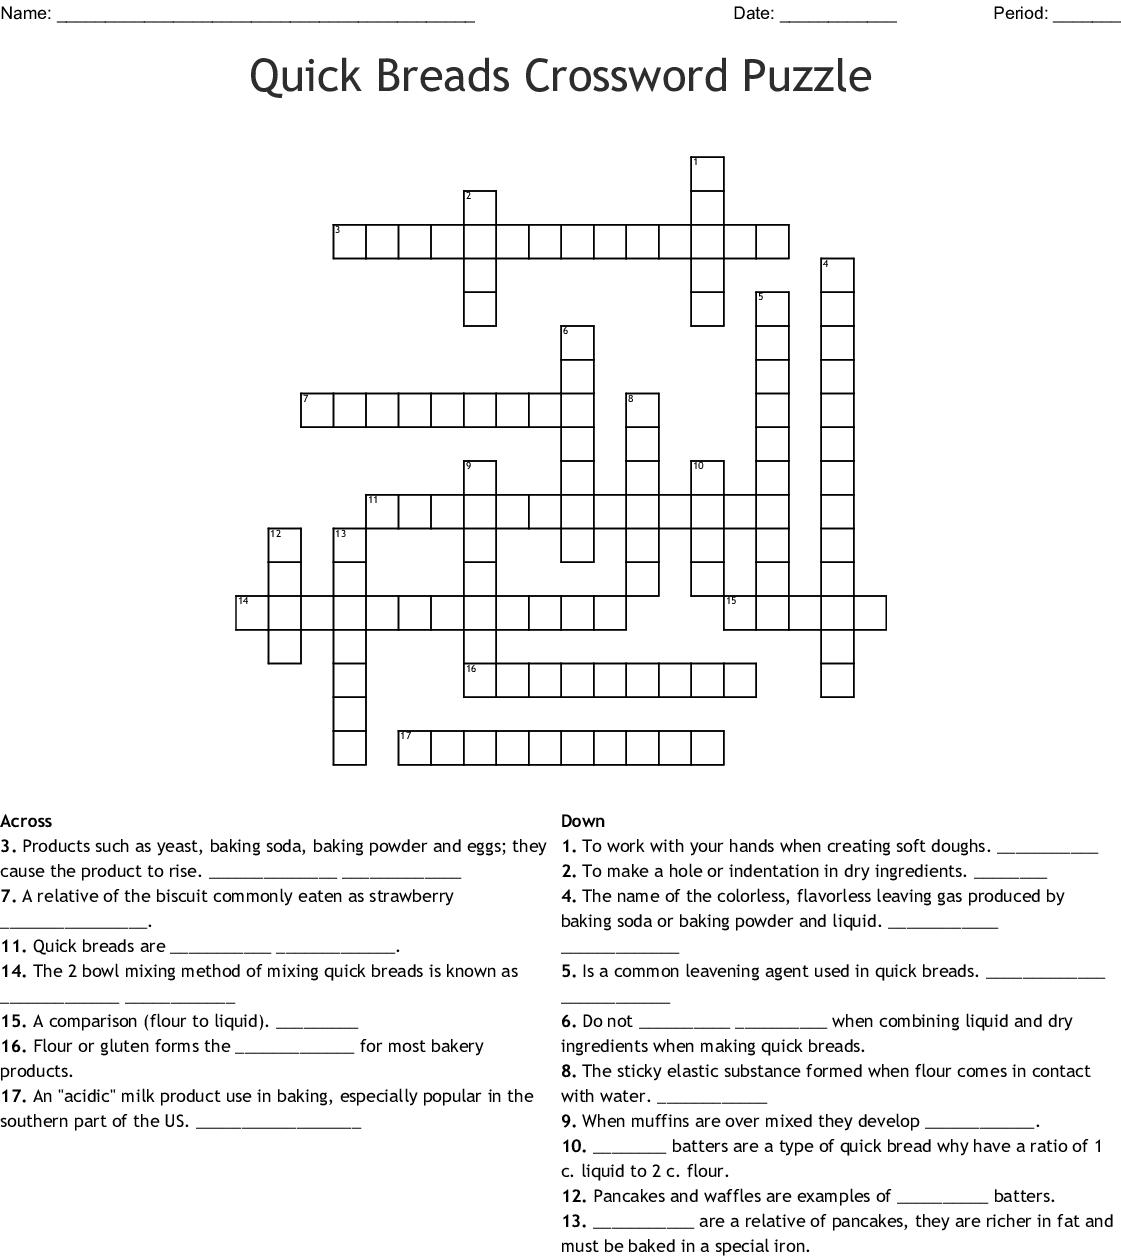 Asl Crossword